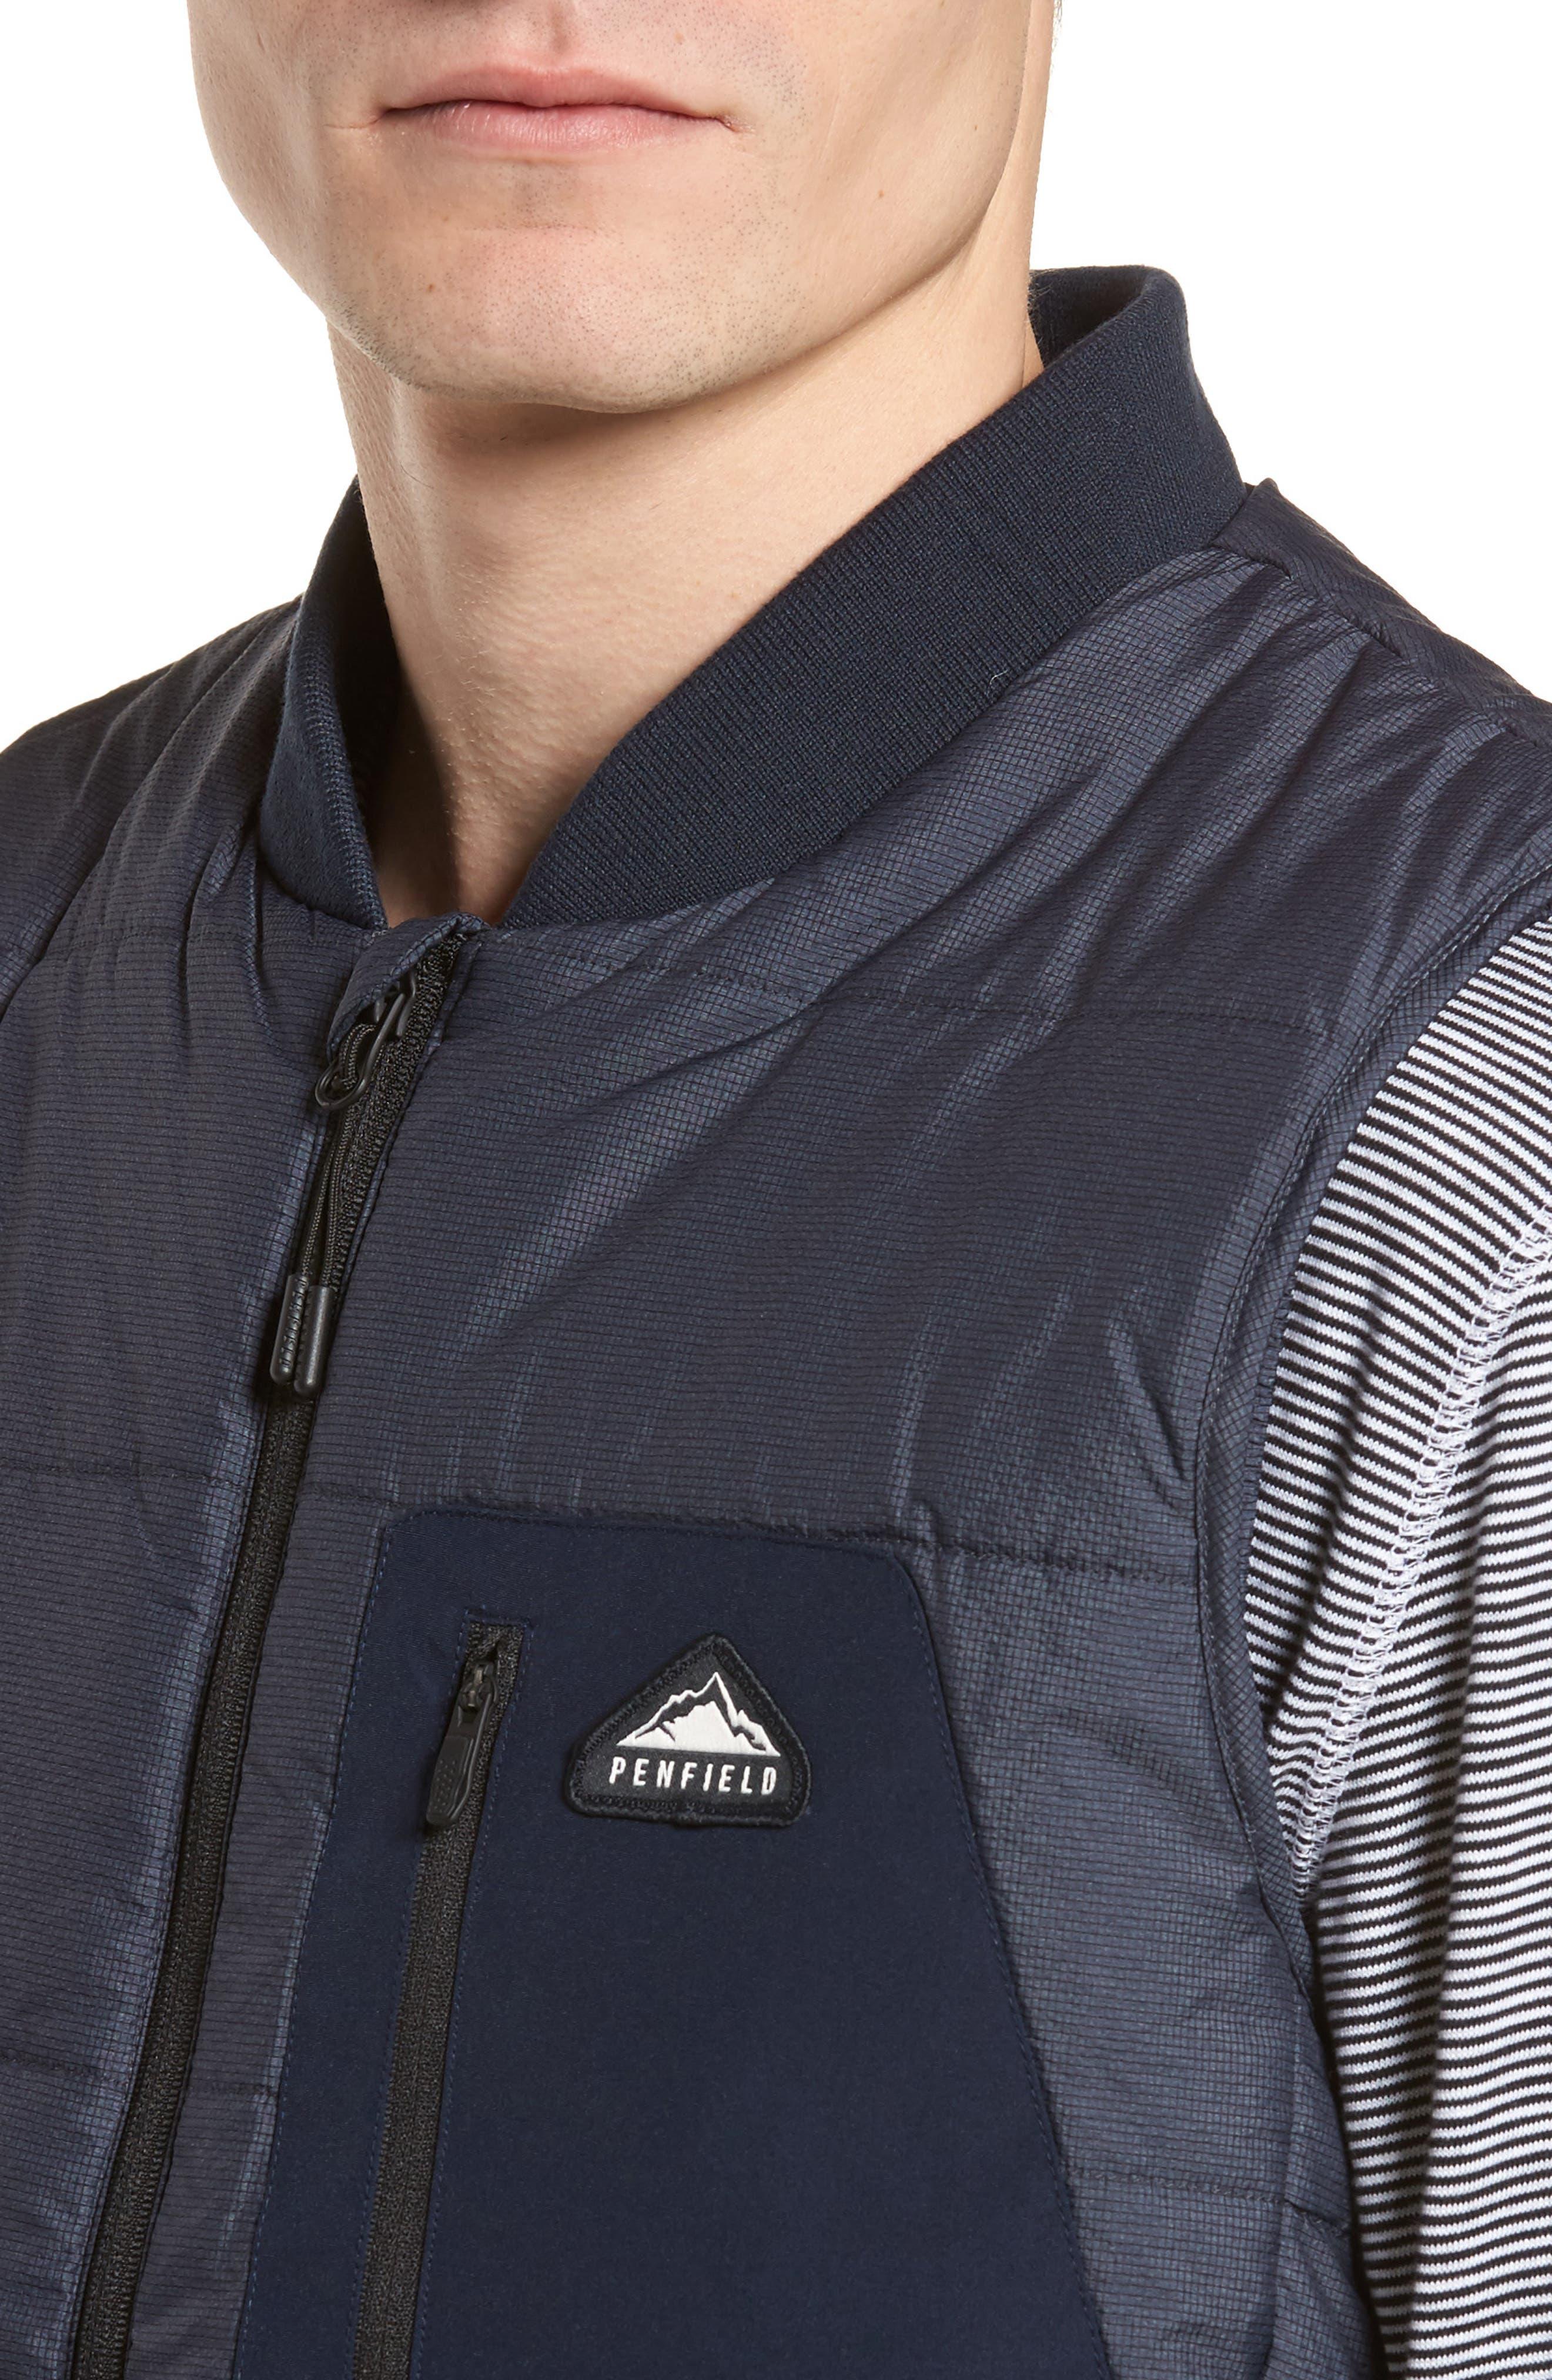 Foley Vest,                             Alternate thumbnail 4, color,                             Navy